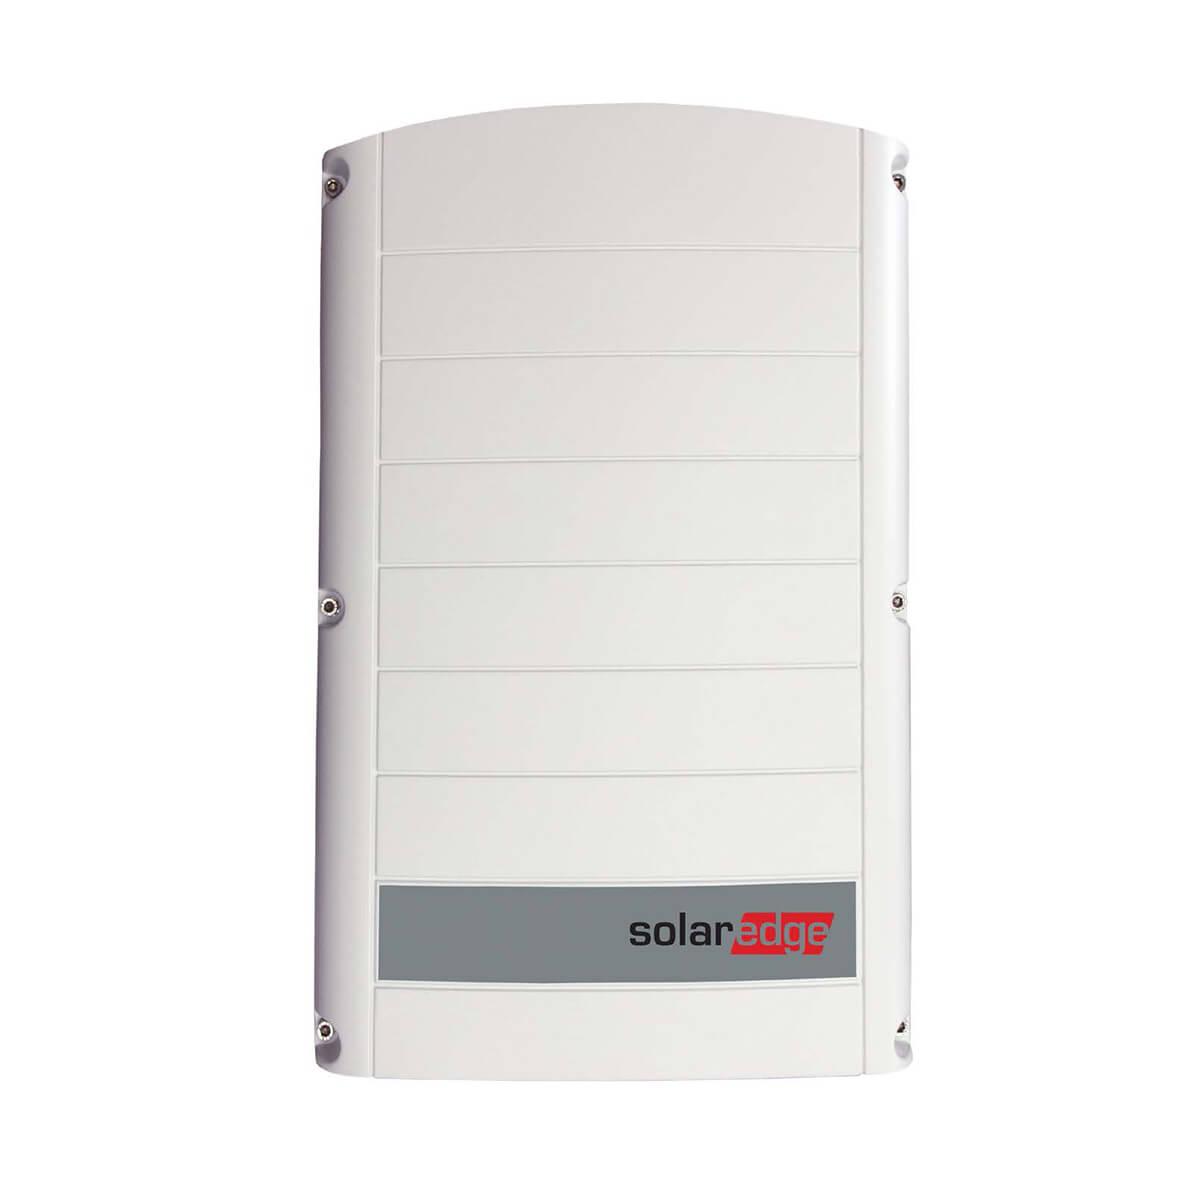 solaredge 8kW inverter, solaredge se8k 8kW inverter, solaredge se8k inverter, solaredge se8k, solaredge 8 kW, SOLAREDGE 8KW